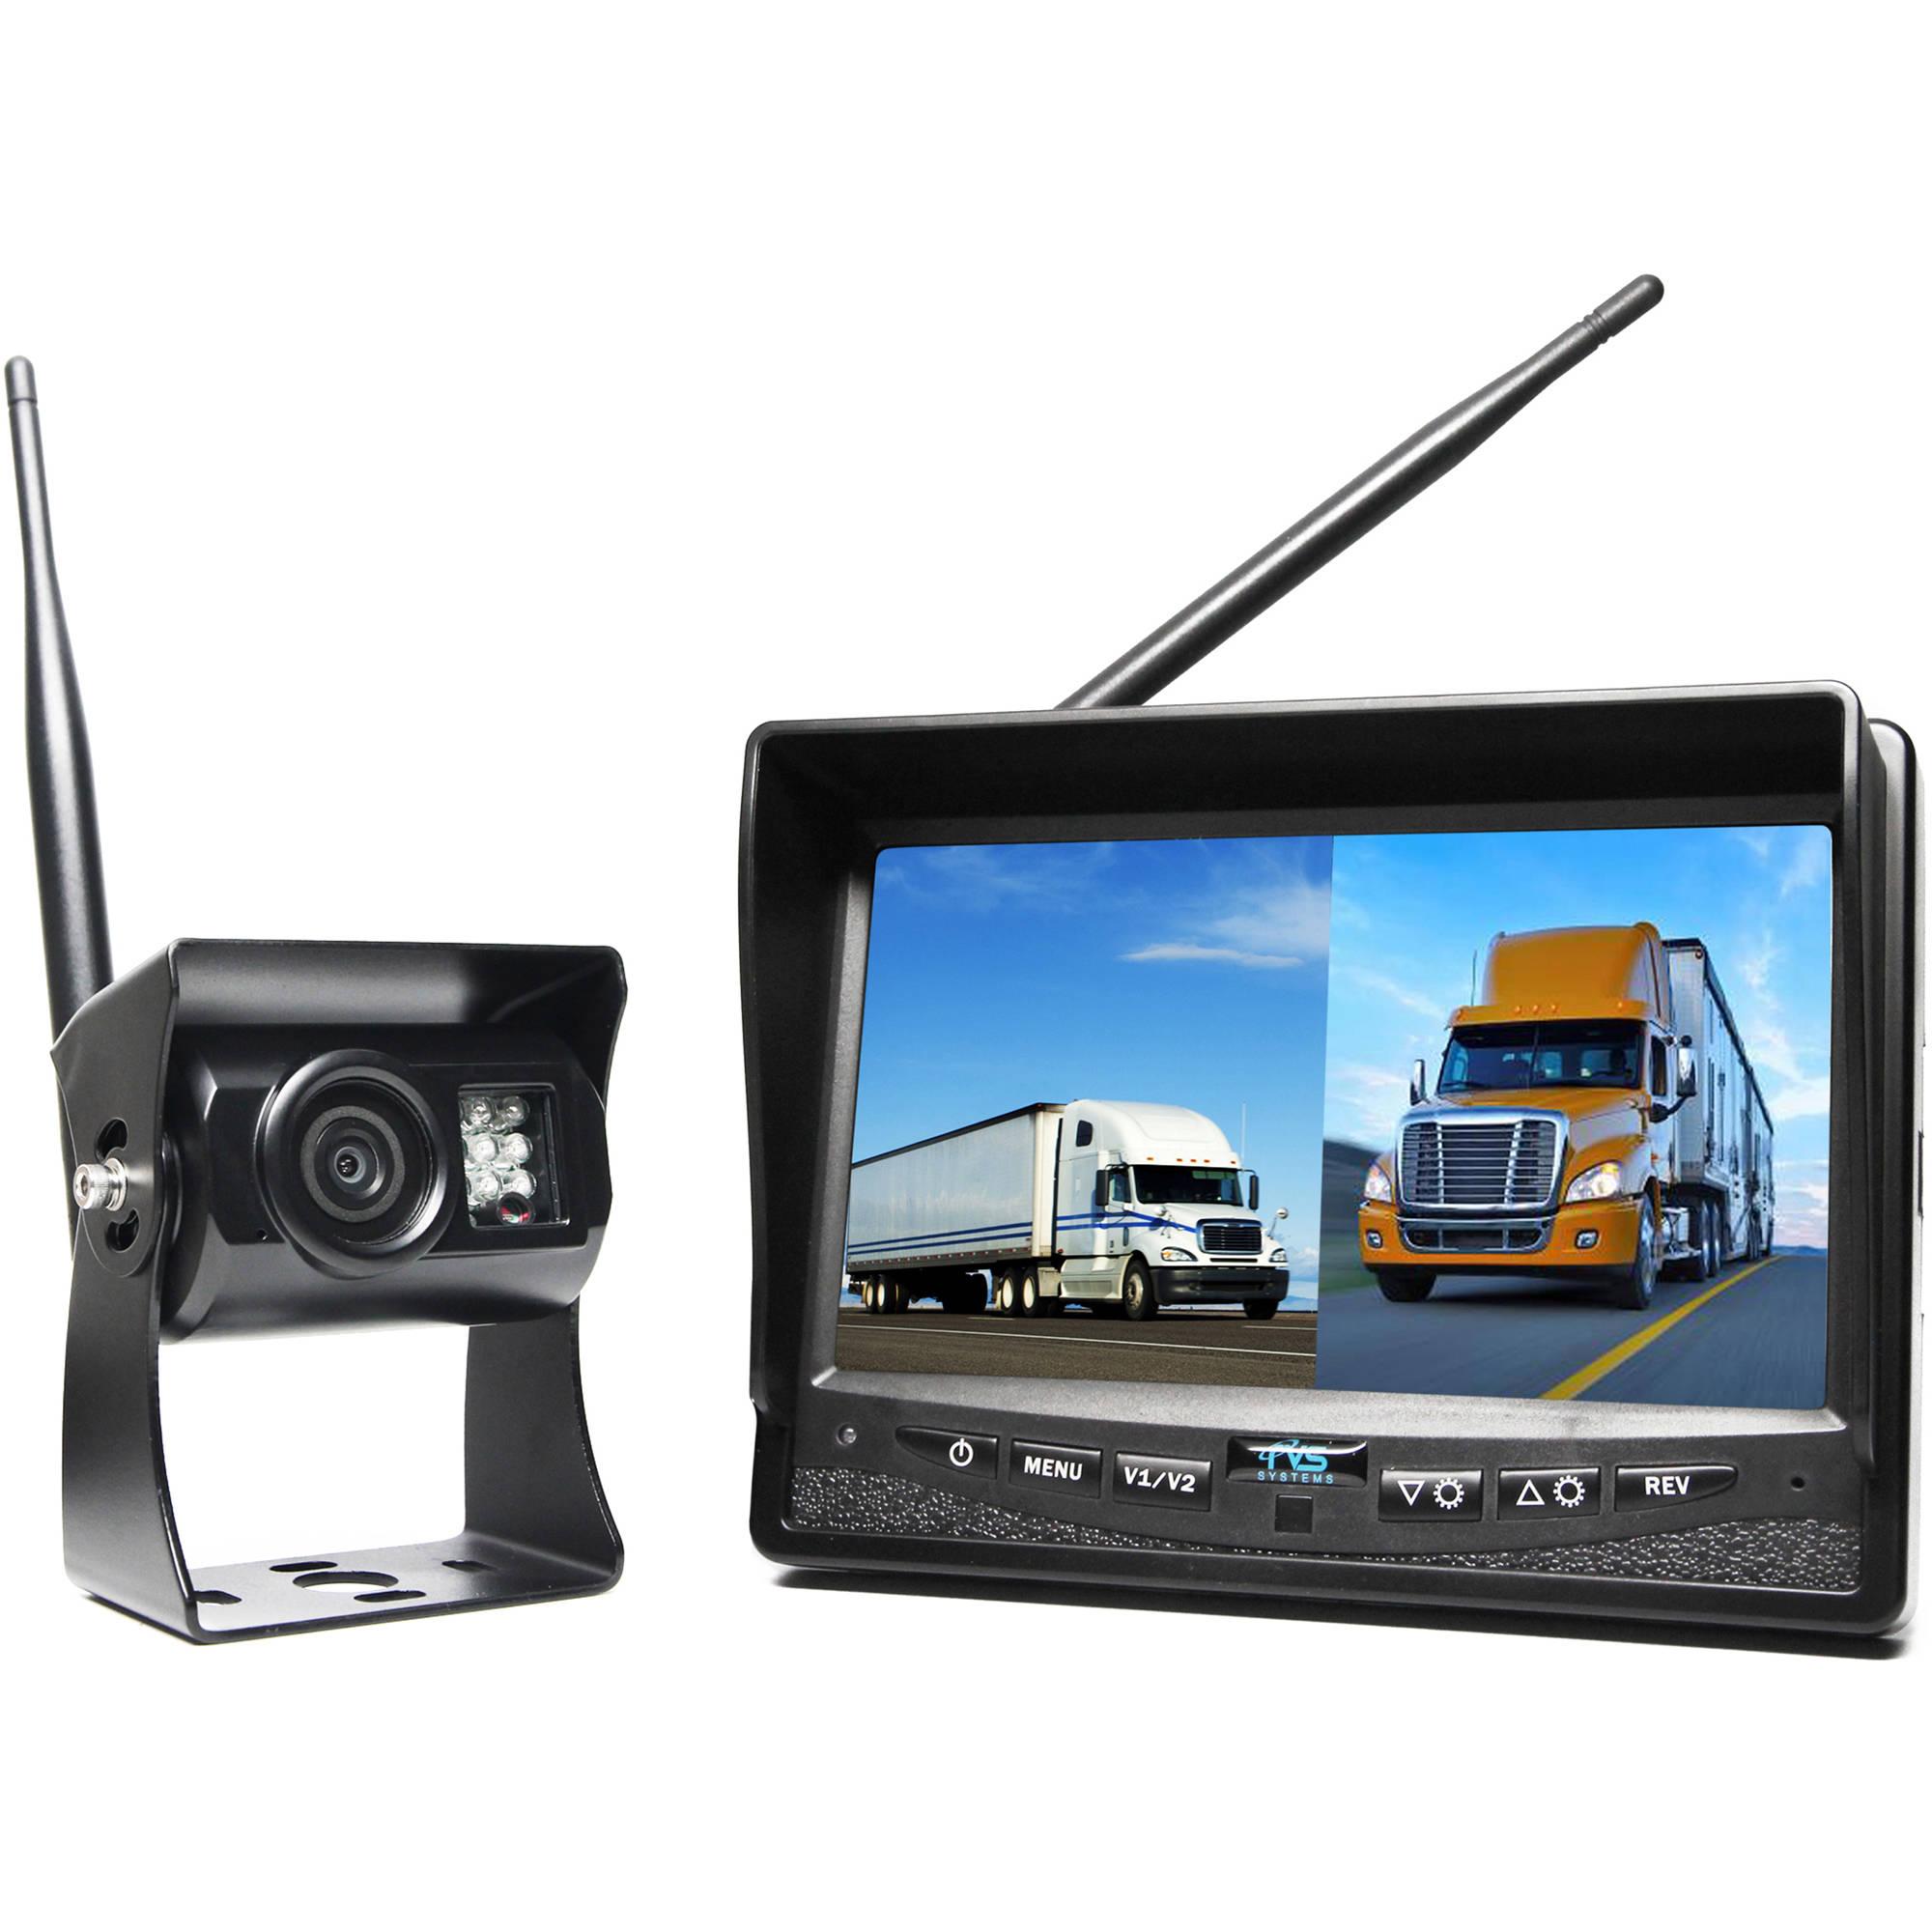 Rear View Safety Rvs 2cam Wireless Backup Camera System